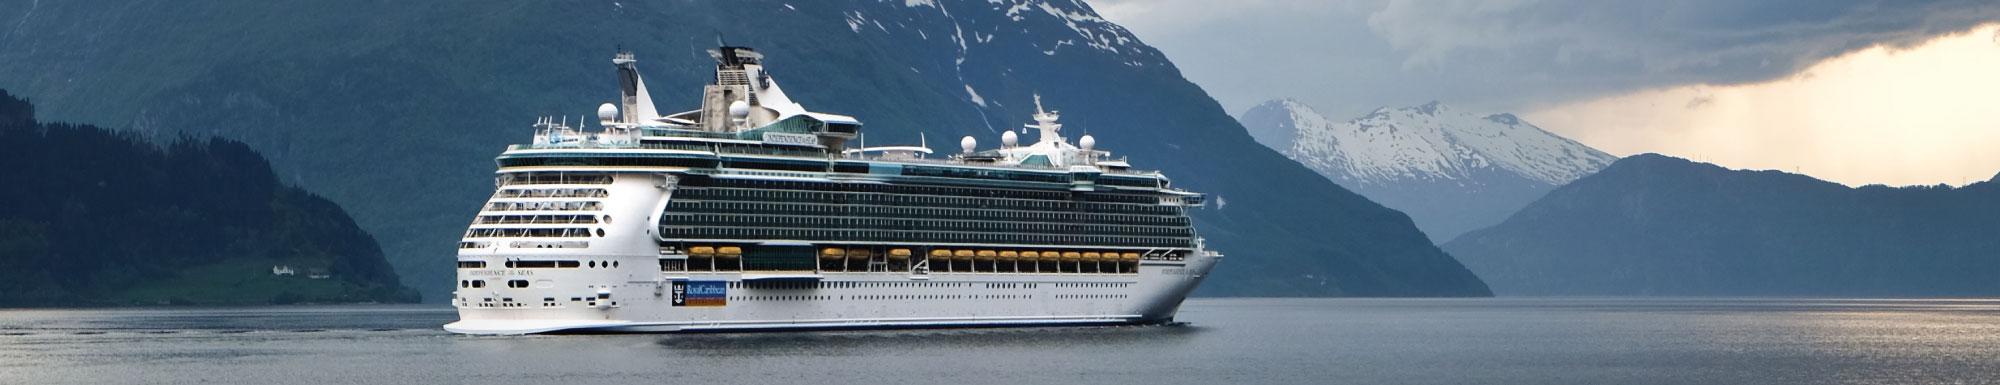 Cruise ship Plan Your Trip Cruise